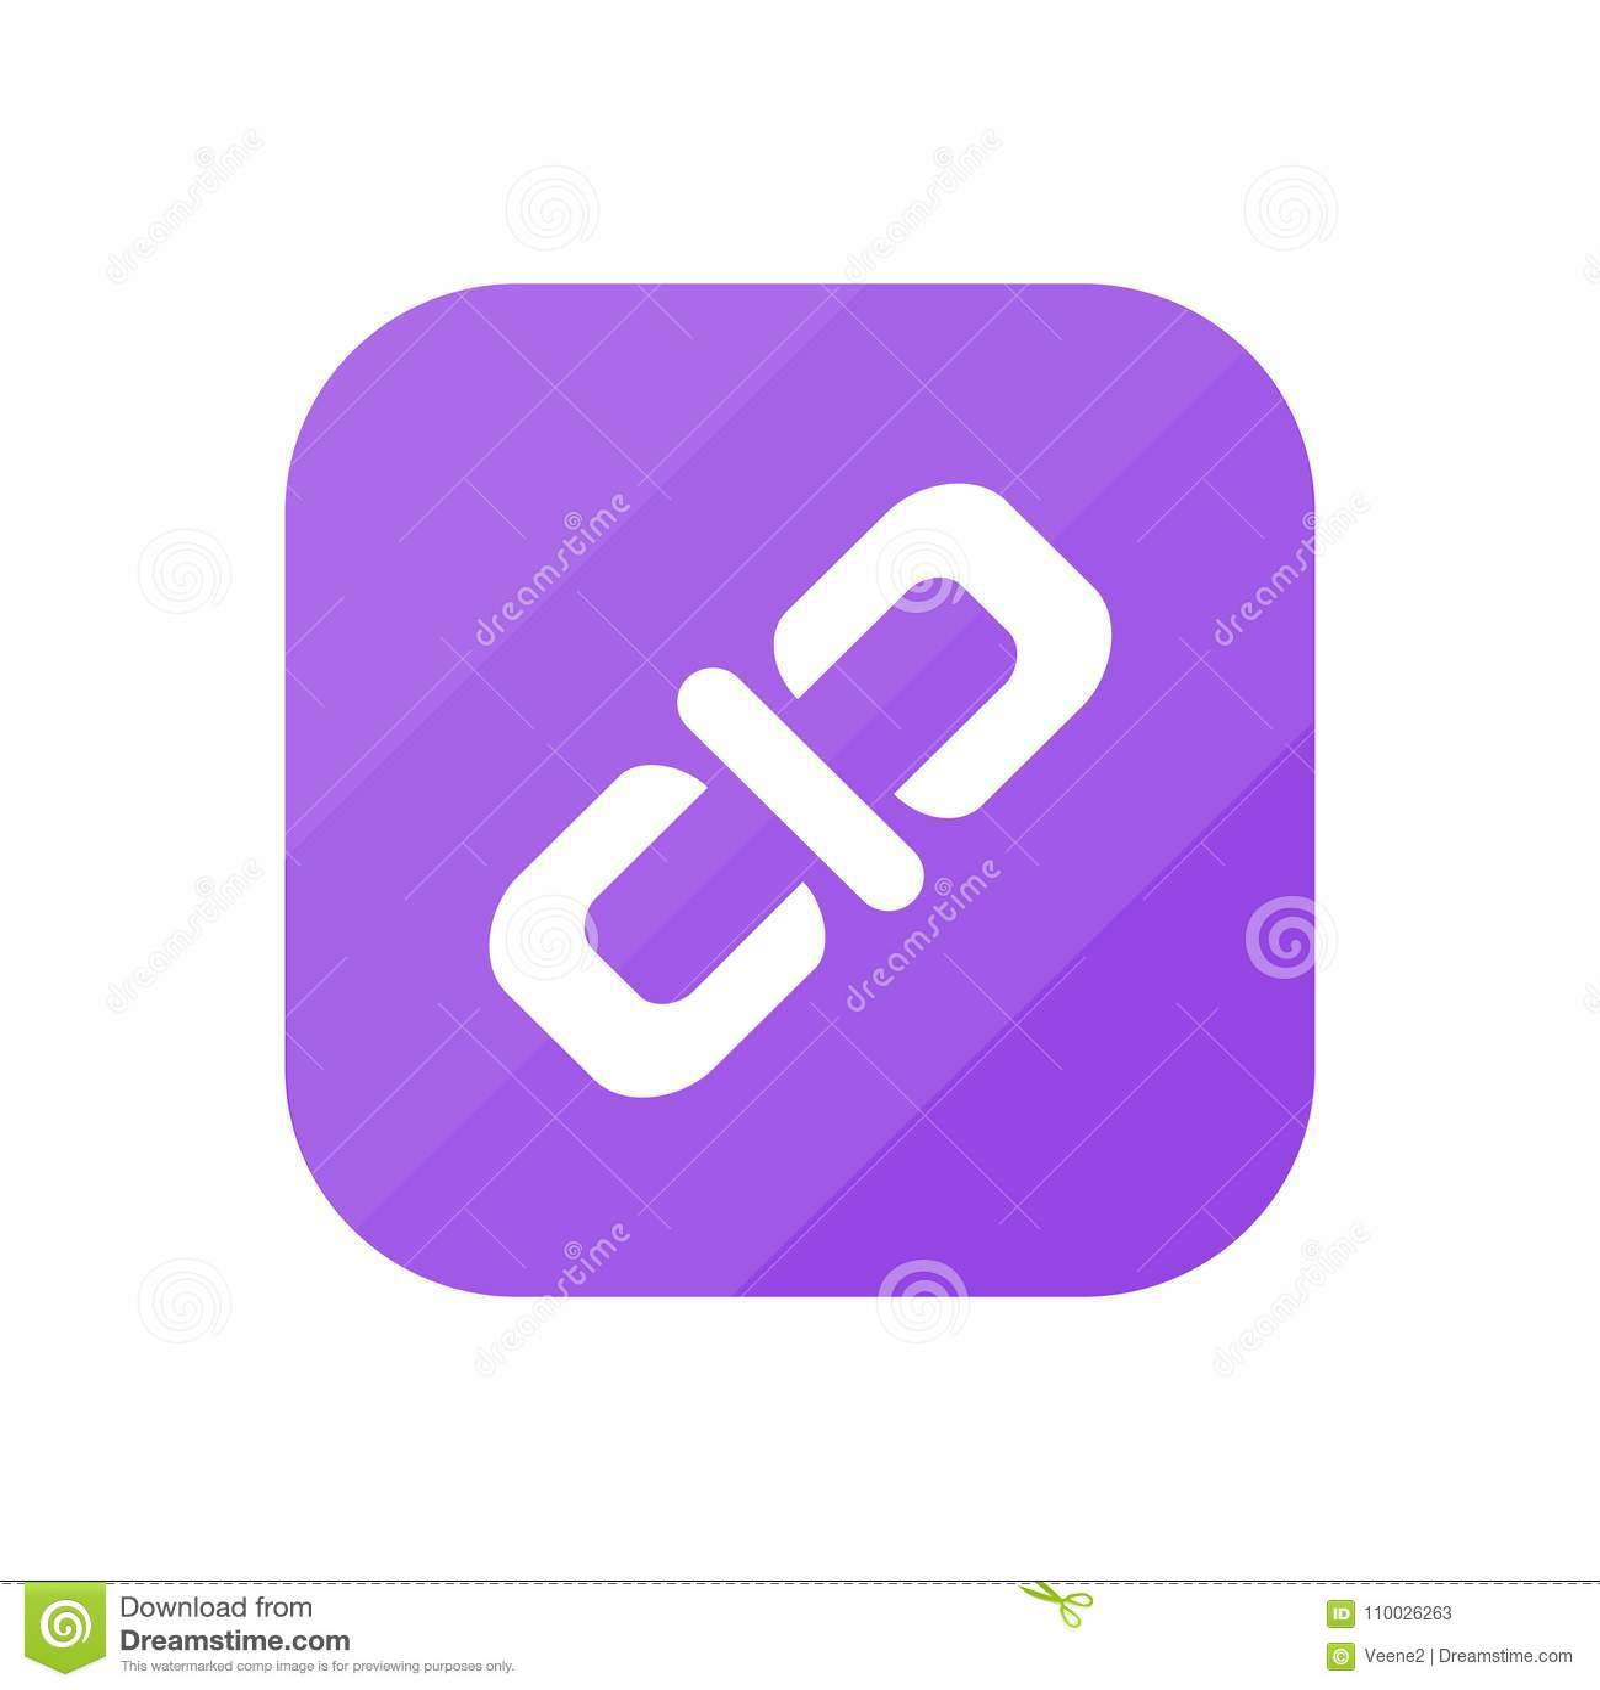 URL - App Pictogram